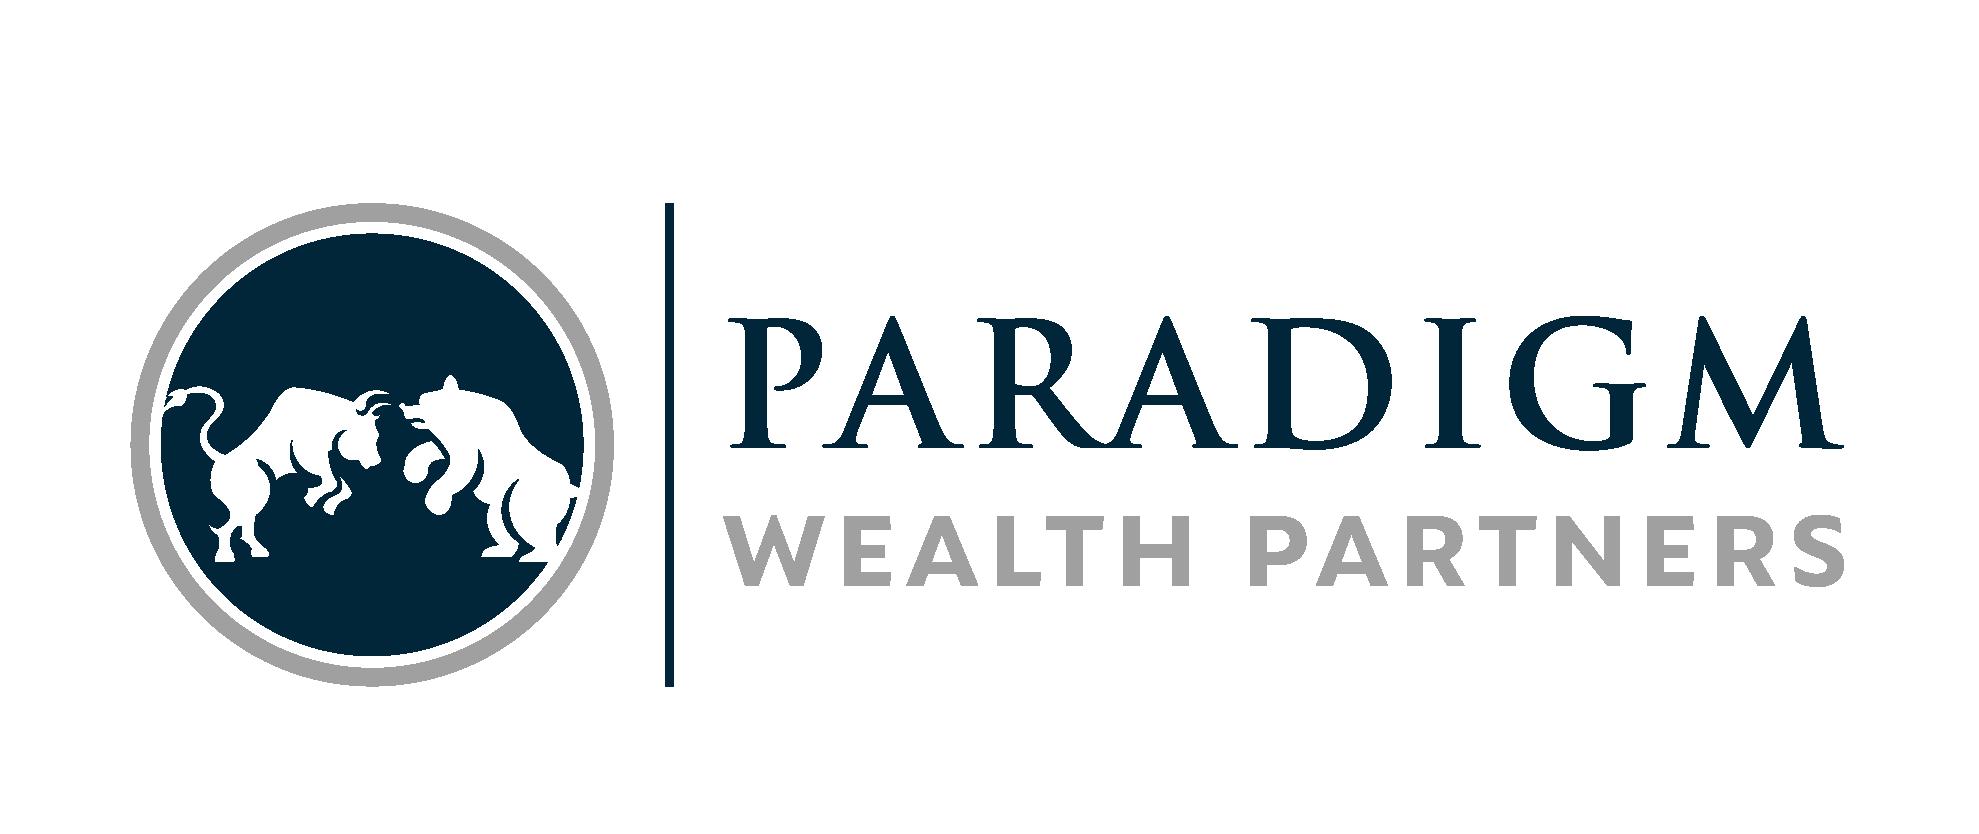 Paradigm Wealth Partners